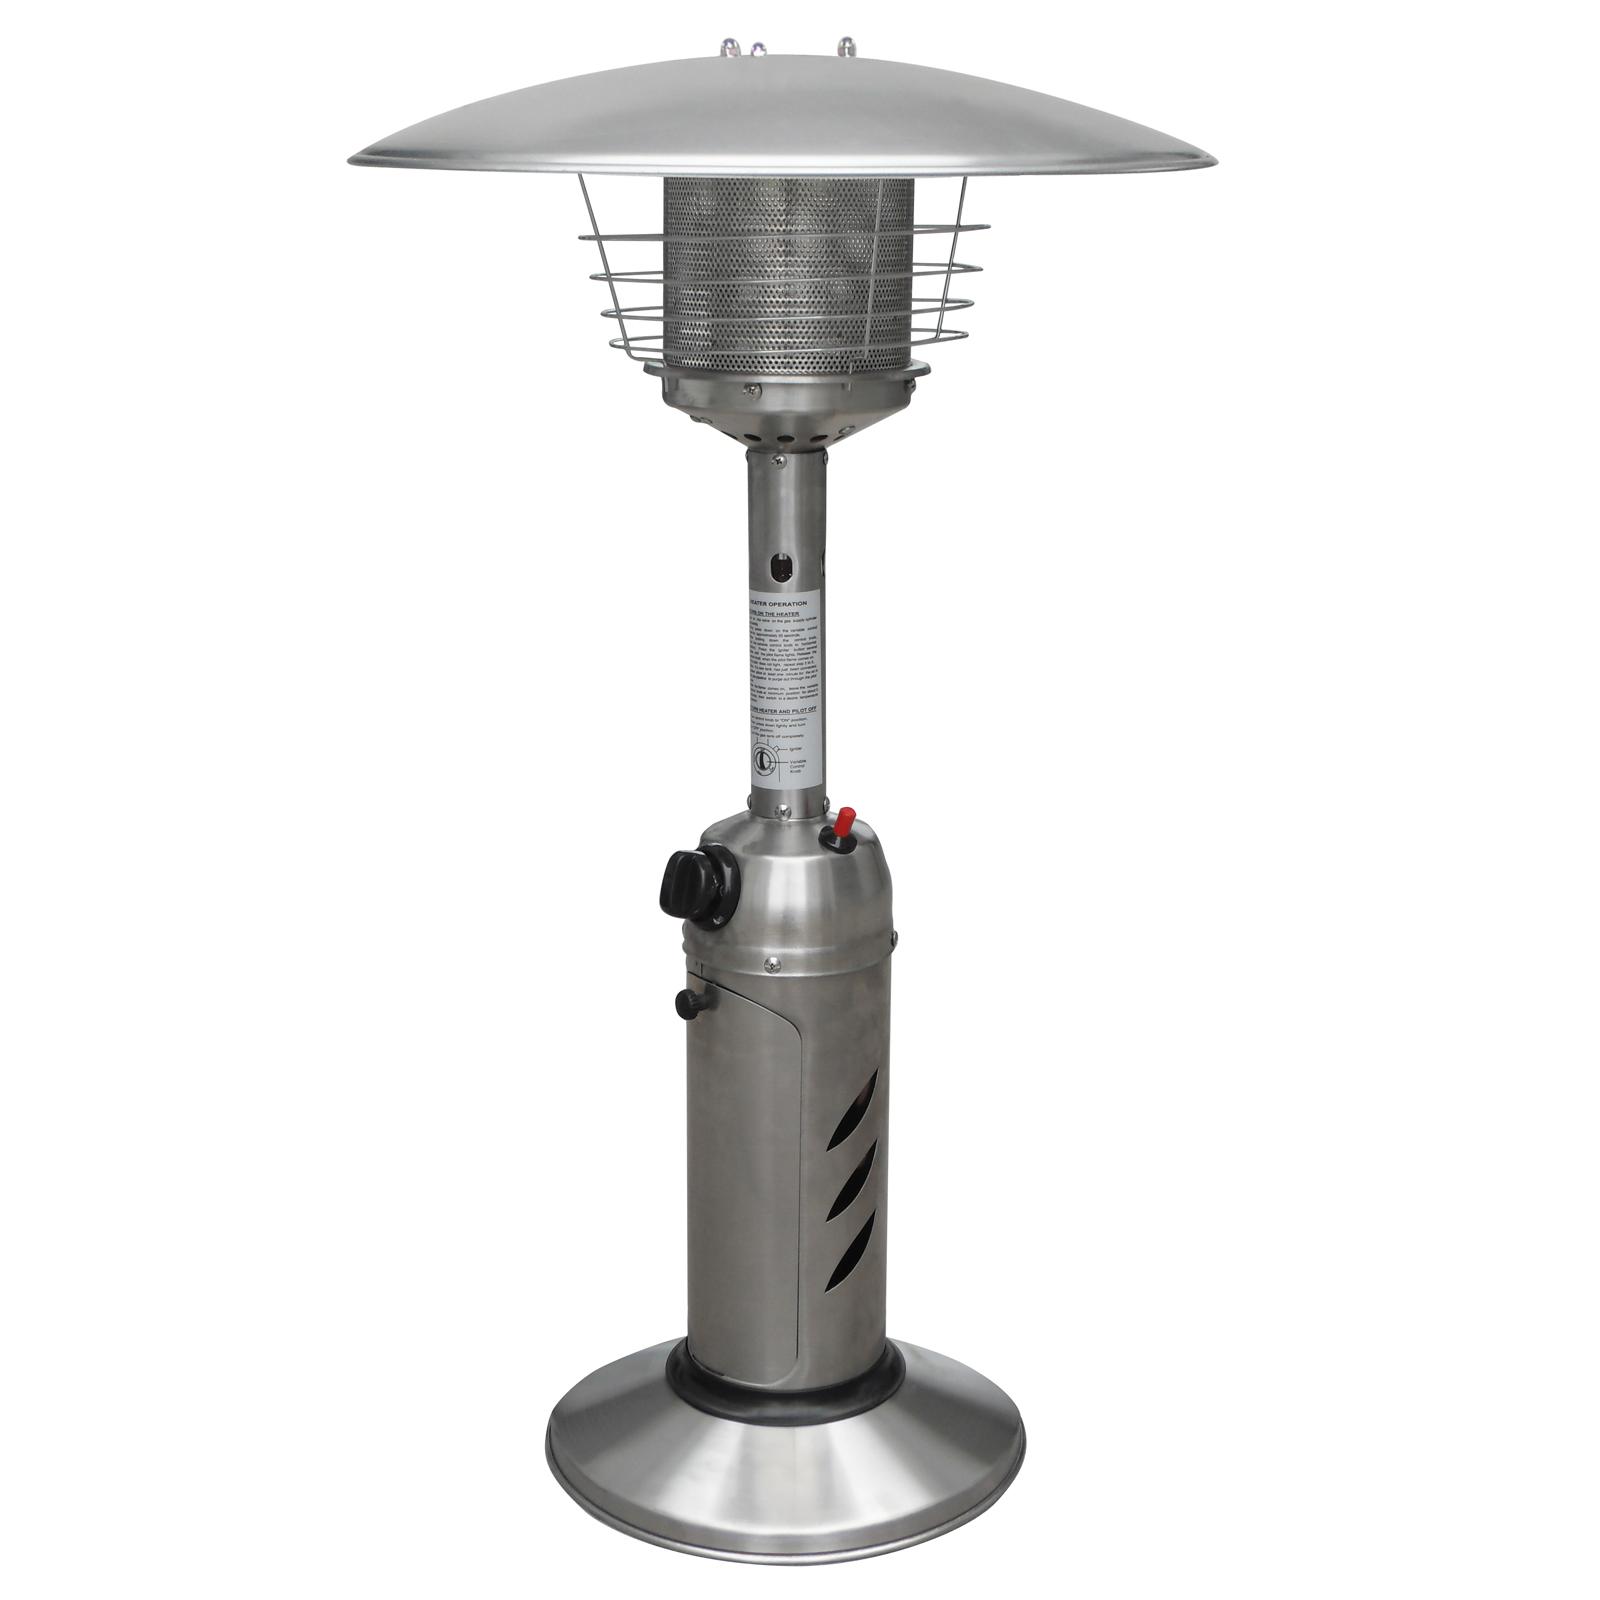 Stainless Steel Tabletop Outdoor Patio Heater Restaurant